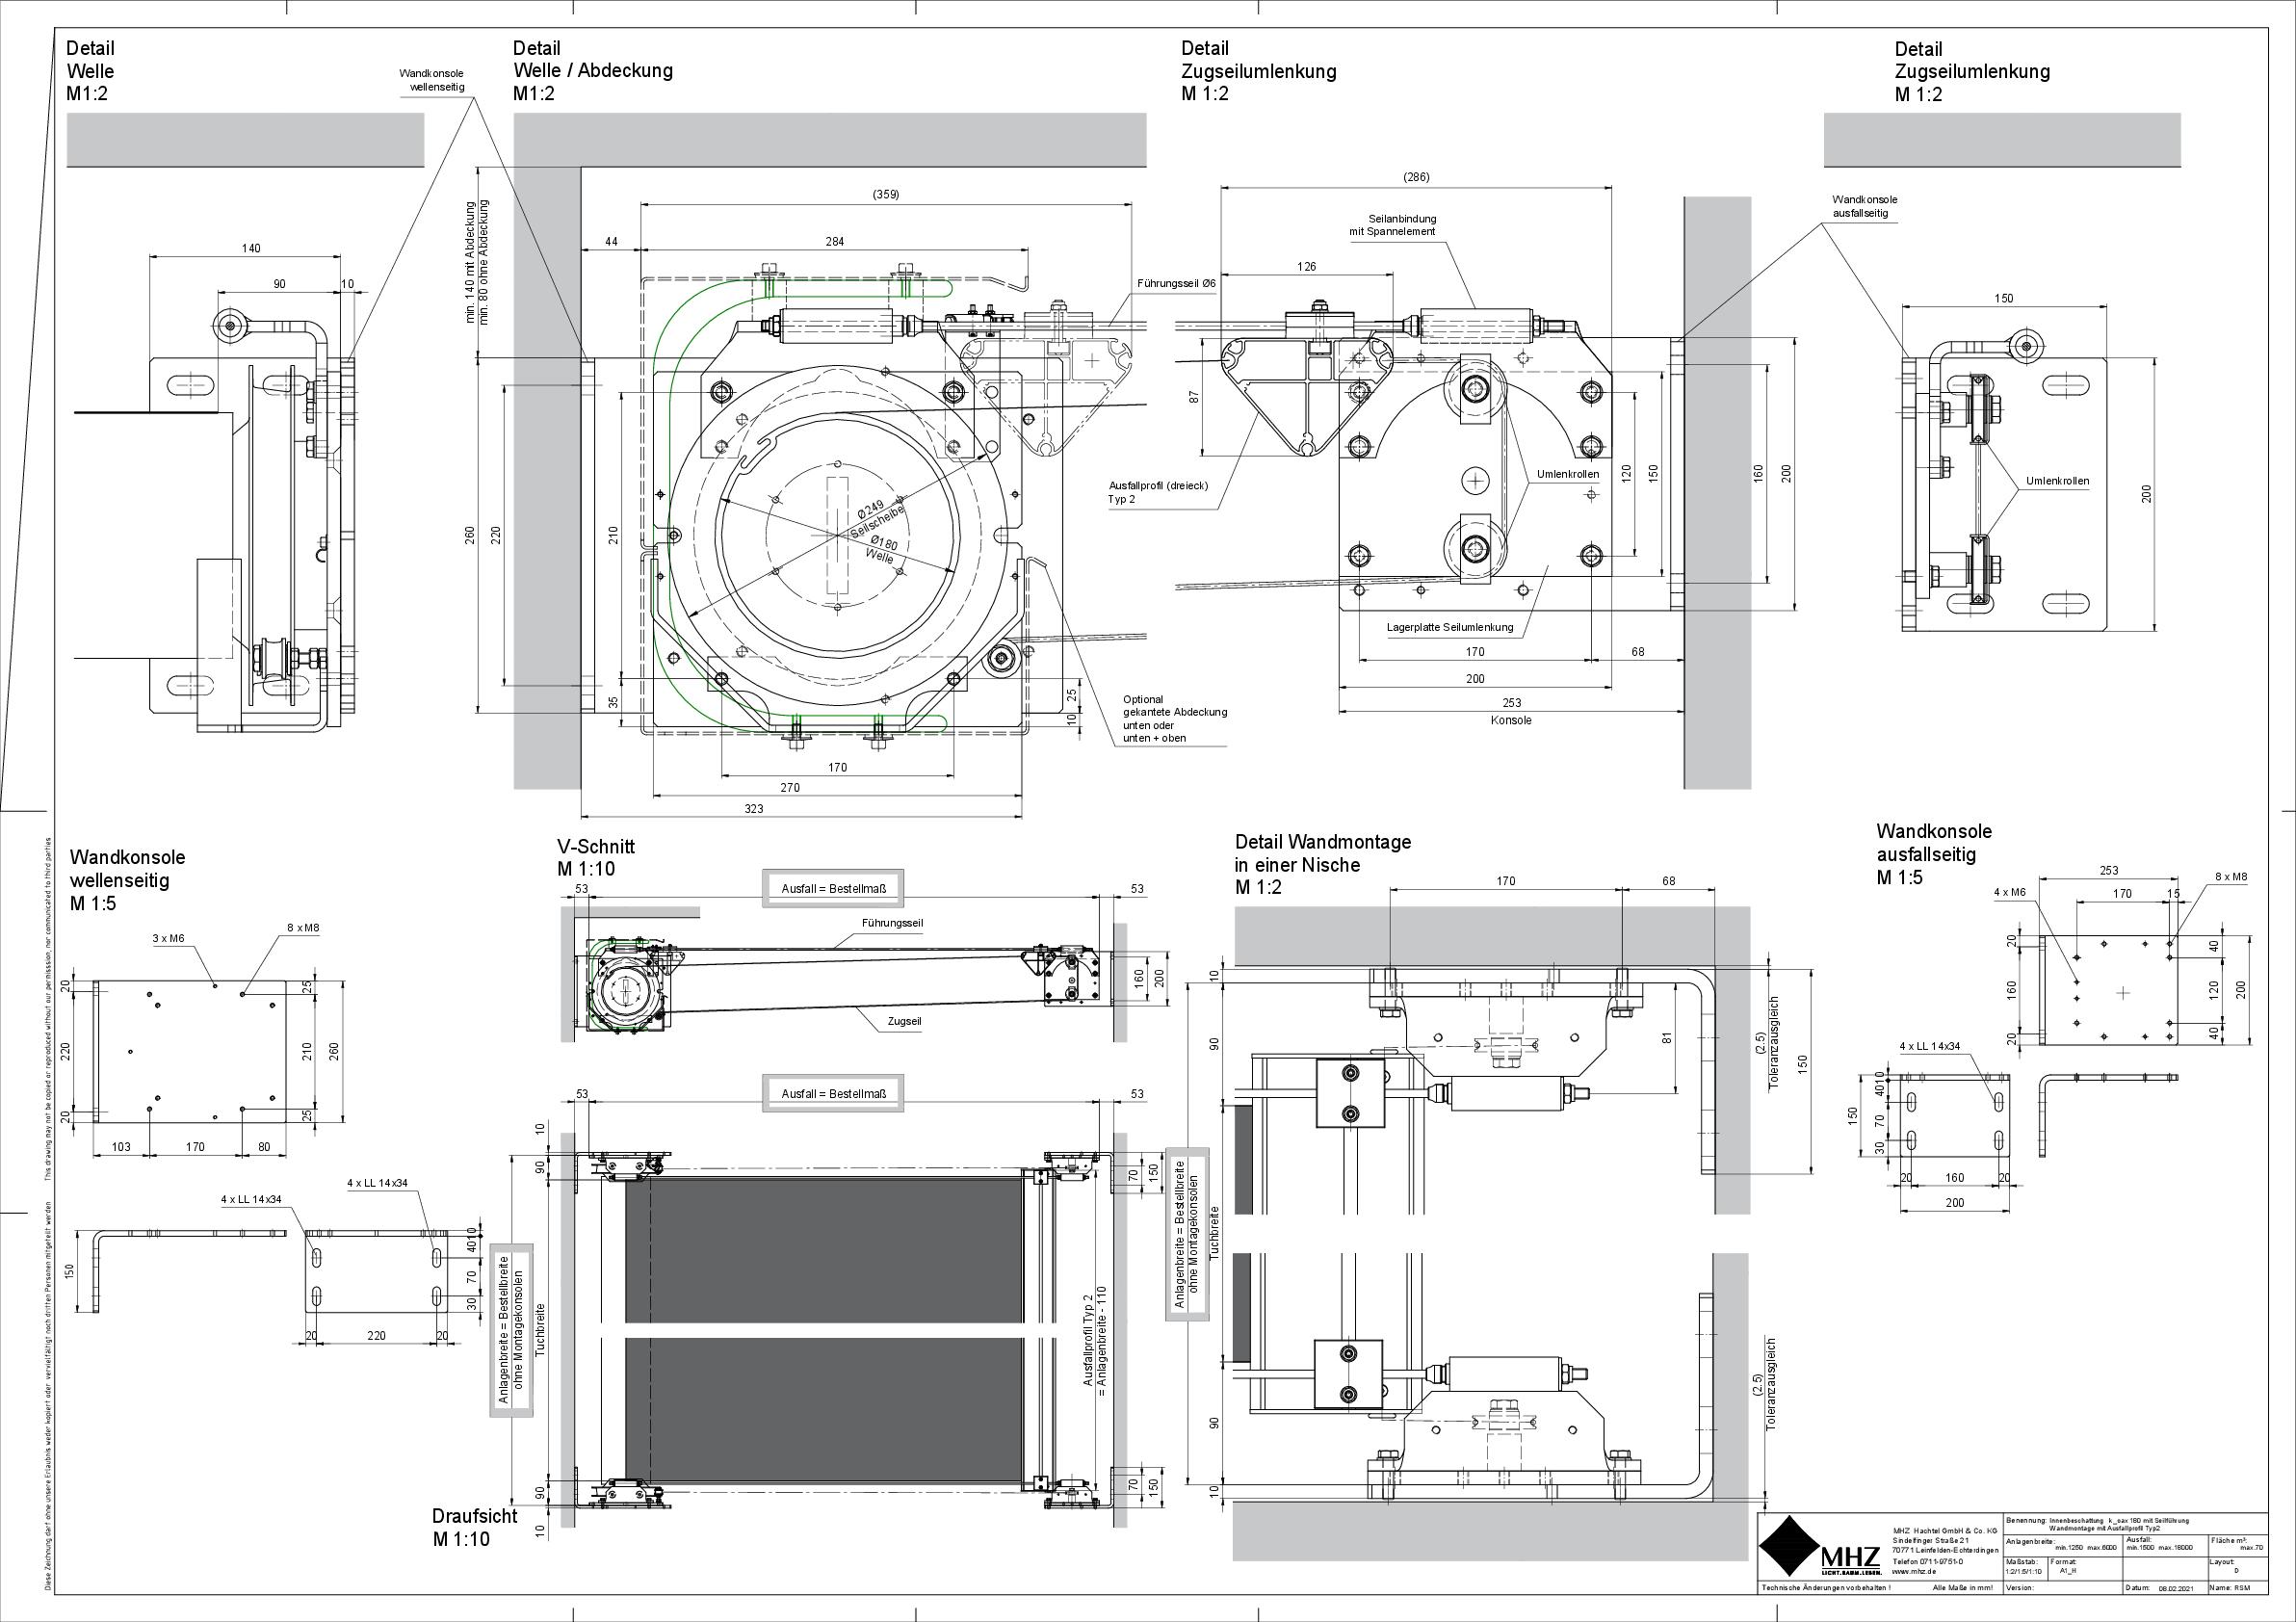 Technische Zeichnung pdf Beschattung k_oax 180